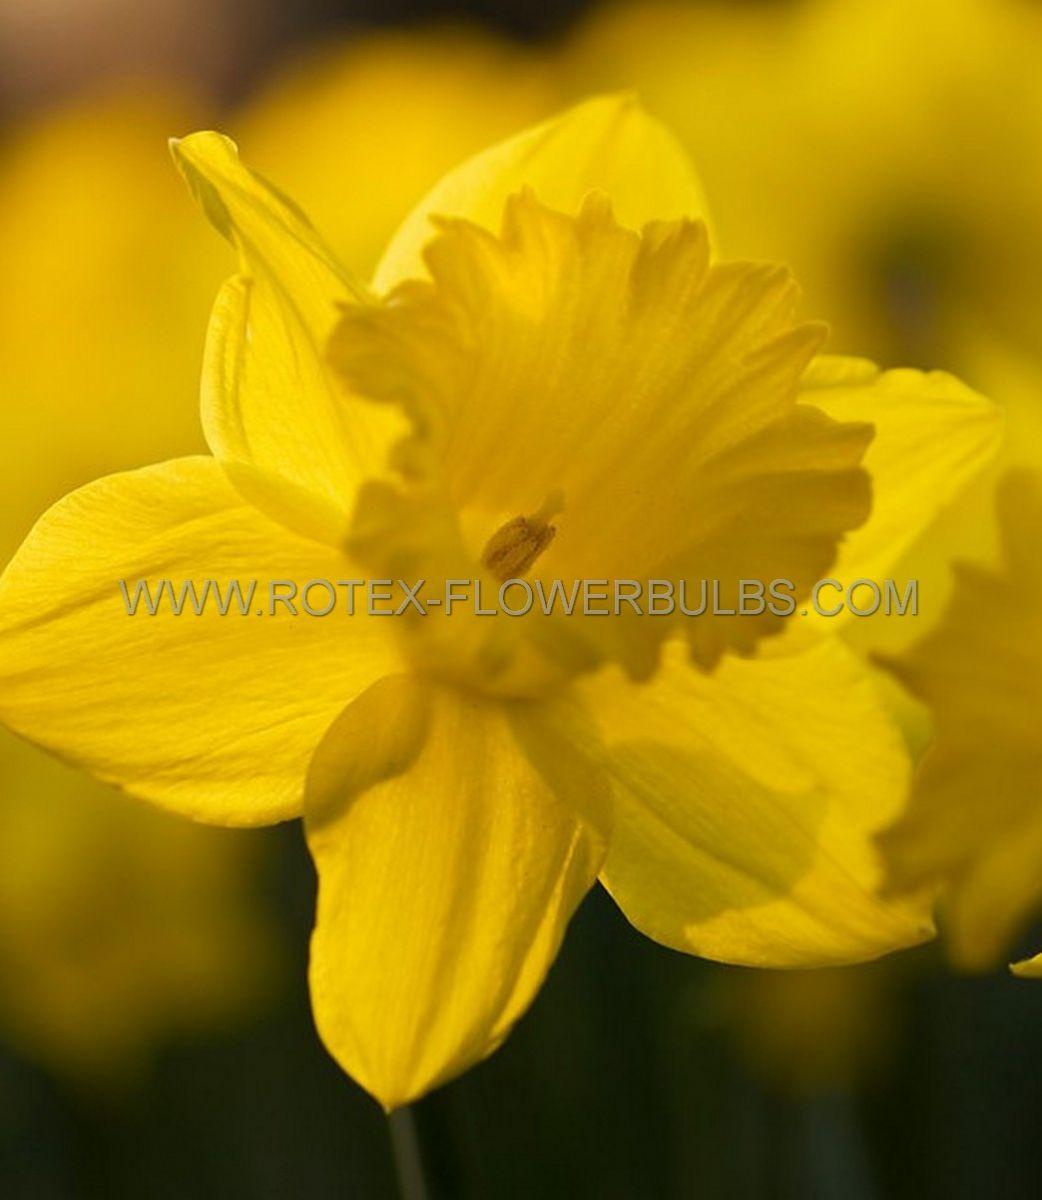 daffodil narcissus trumpet dutch master 1618 150 pplastic tray